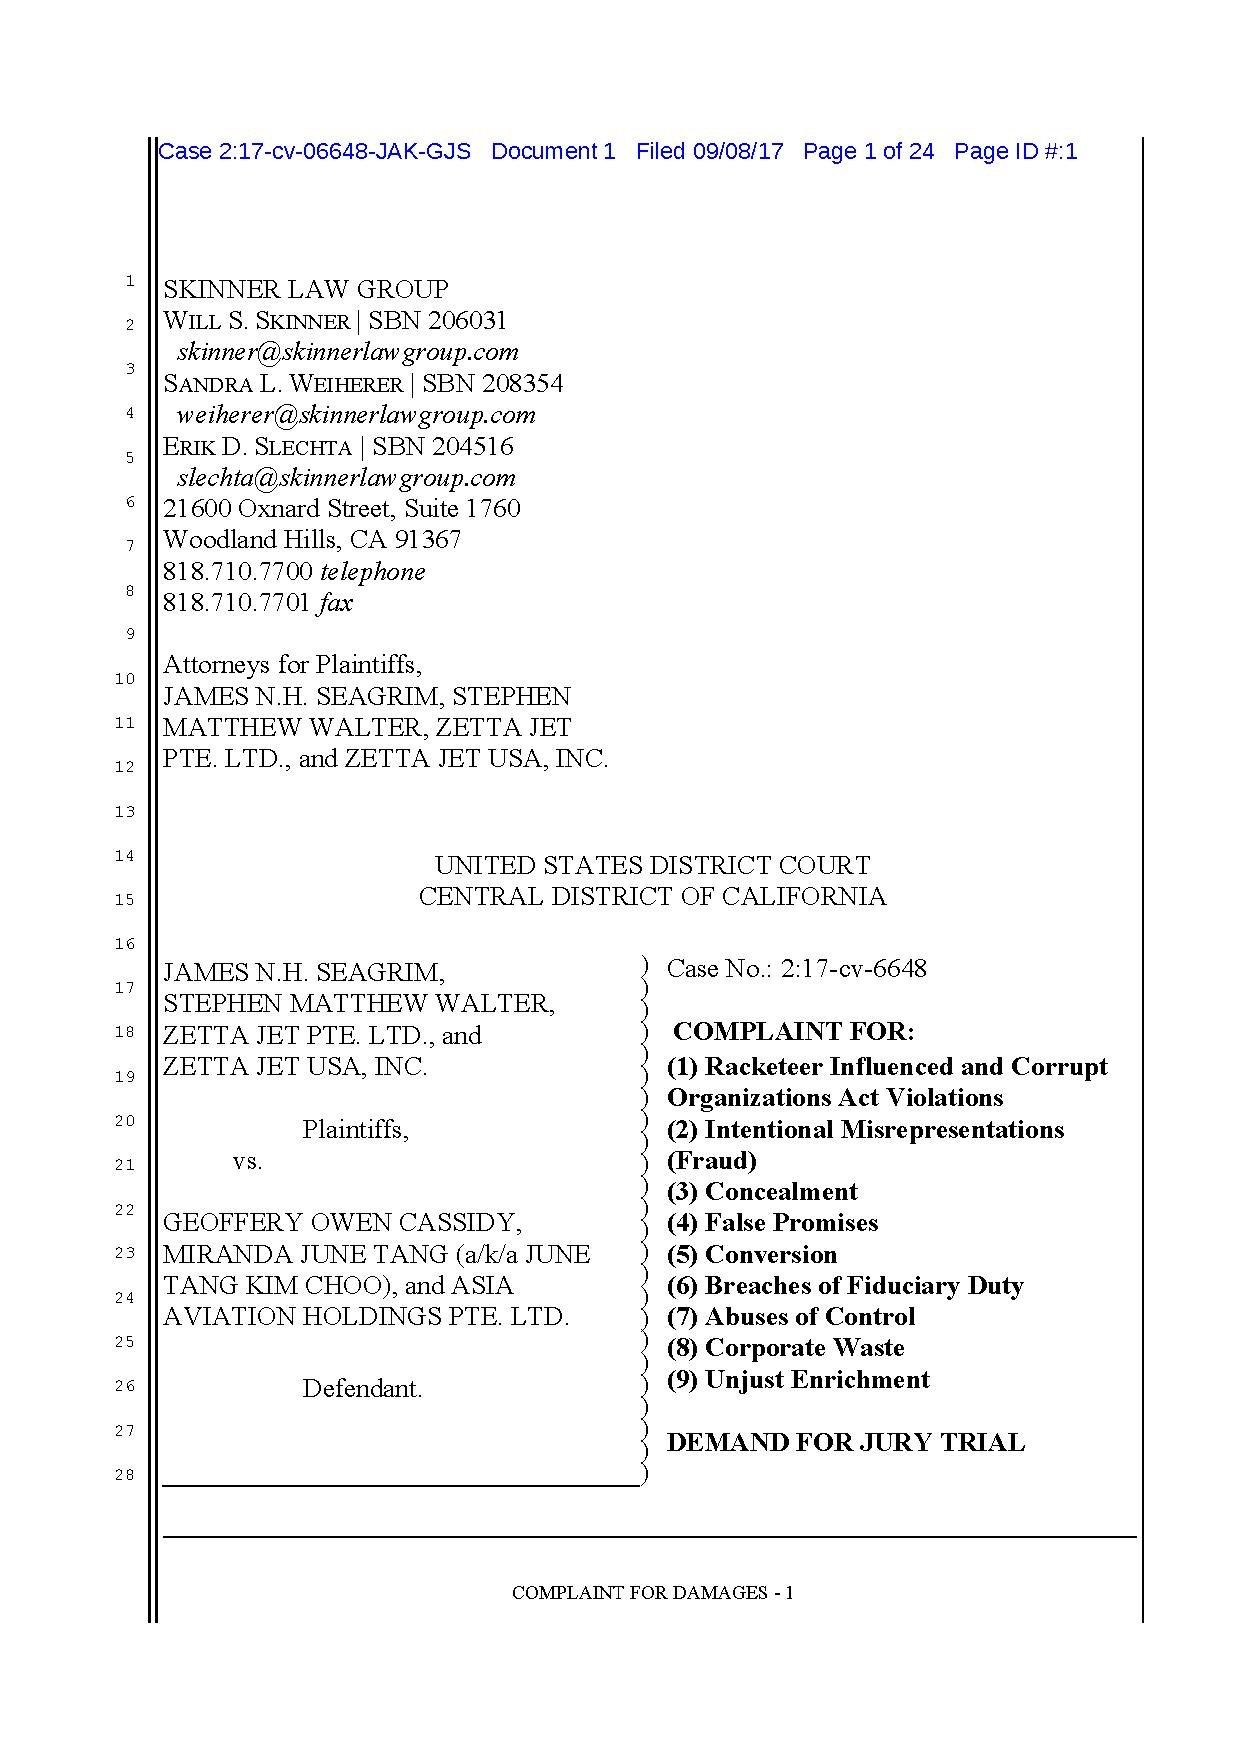 File:Zetta Jet vs  Geoffrey Cassidy fraud US District Court of